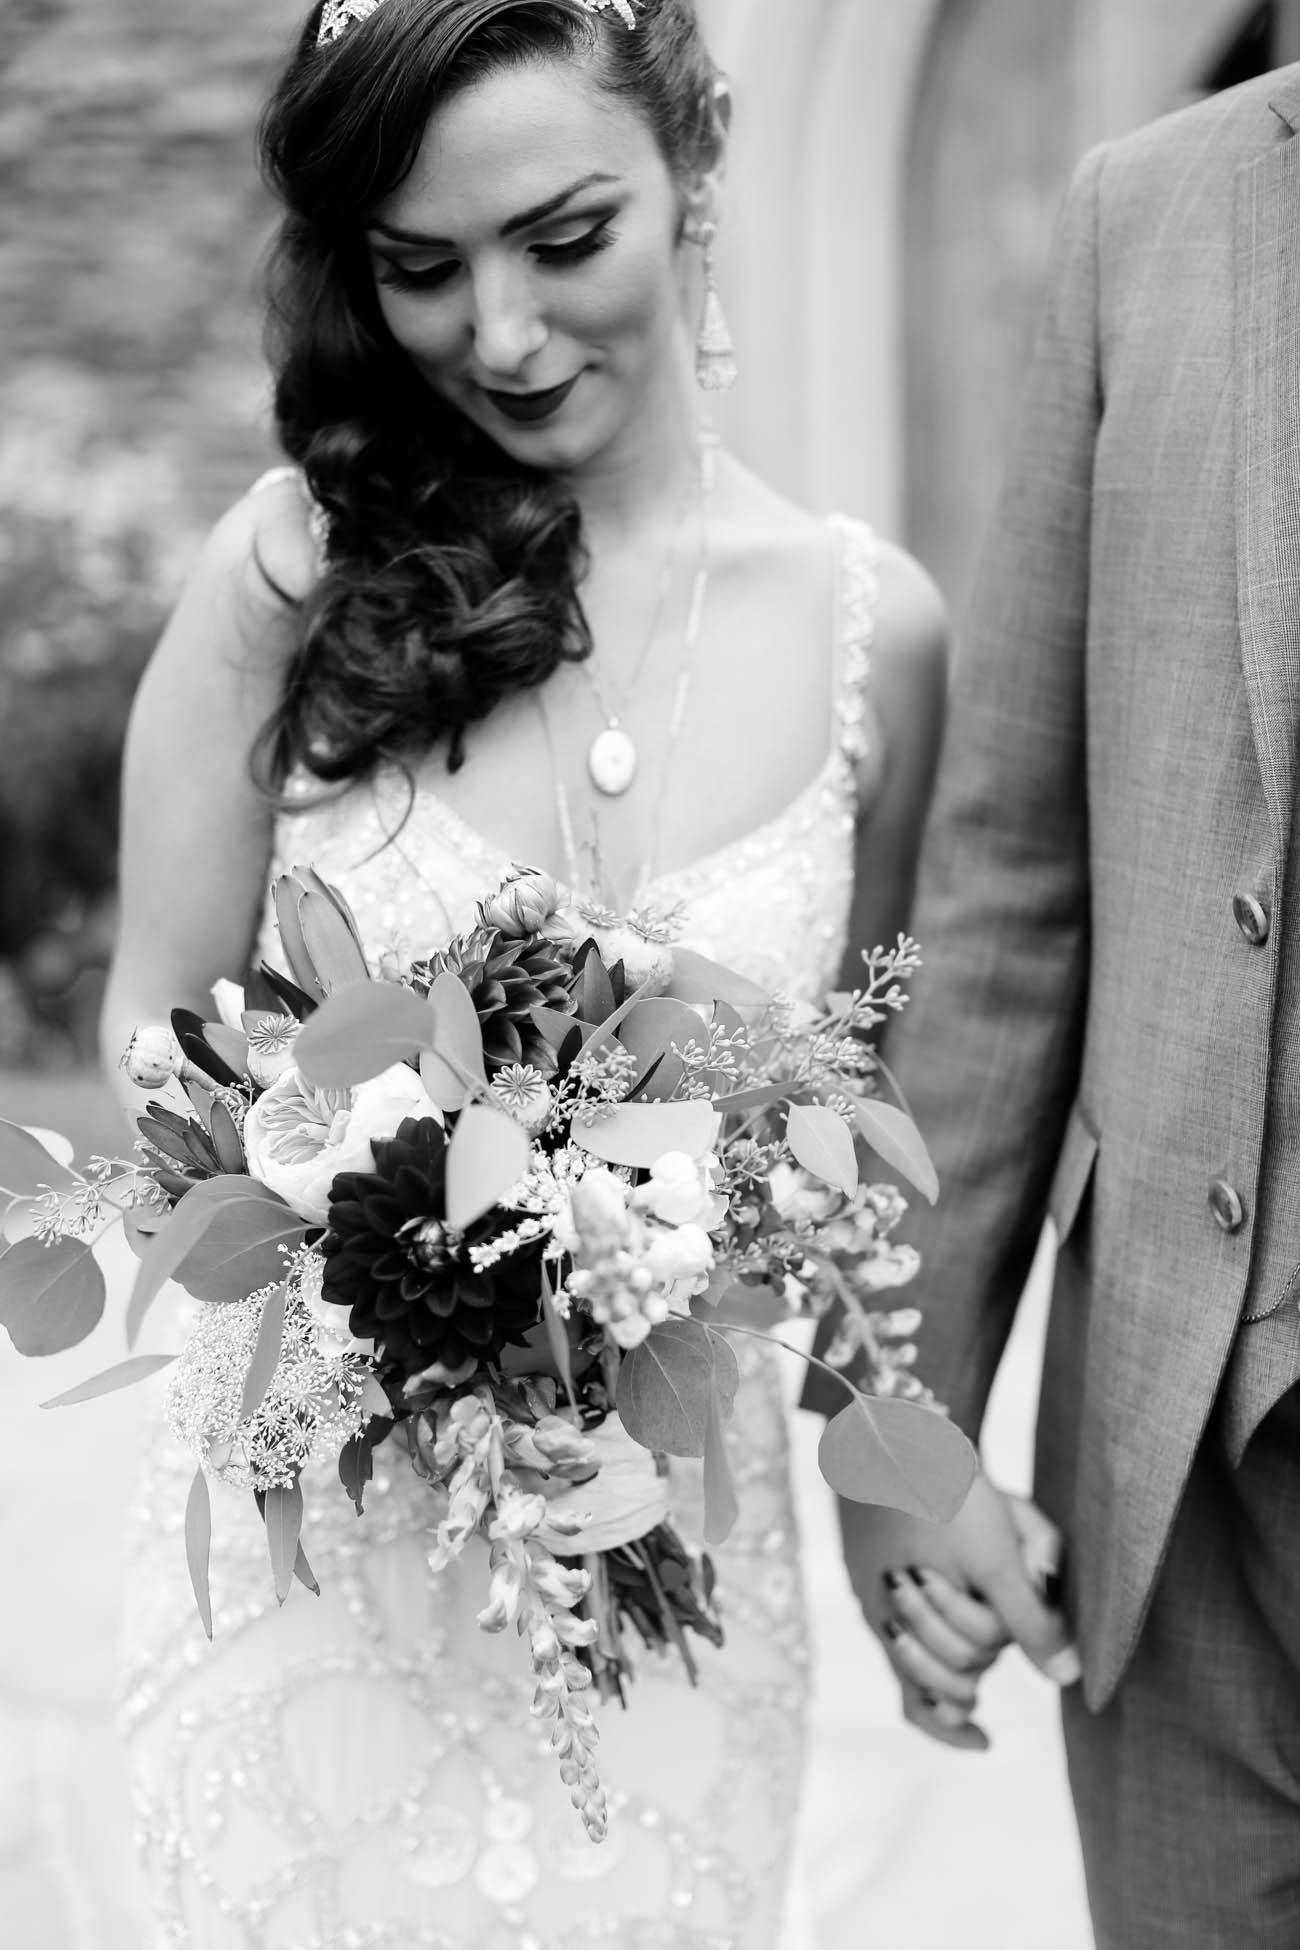 Speakeasy-1920s-theme-Louisville-and-Lexington Wedding-110.jpg